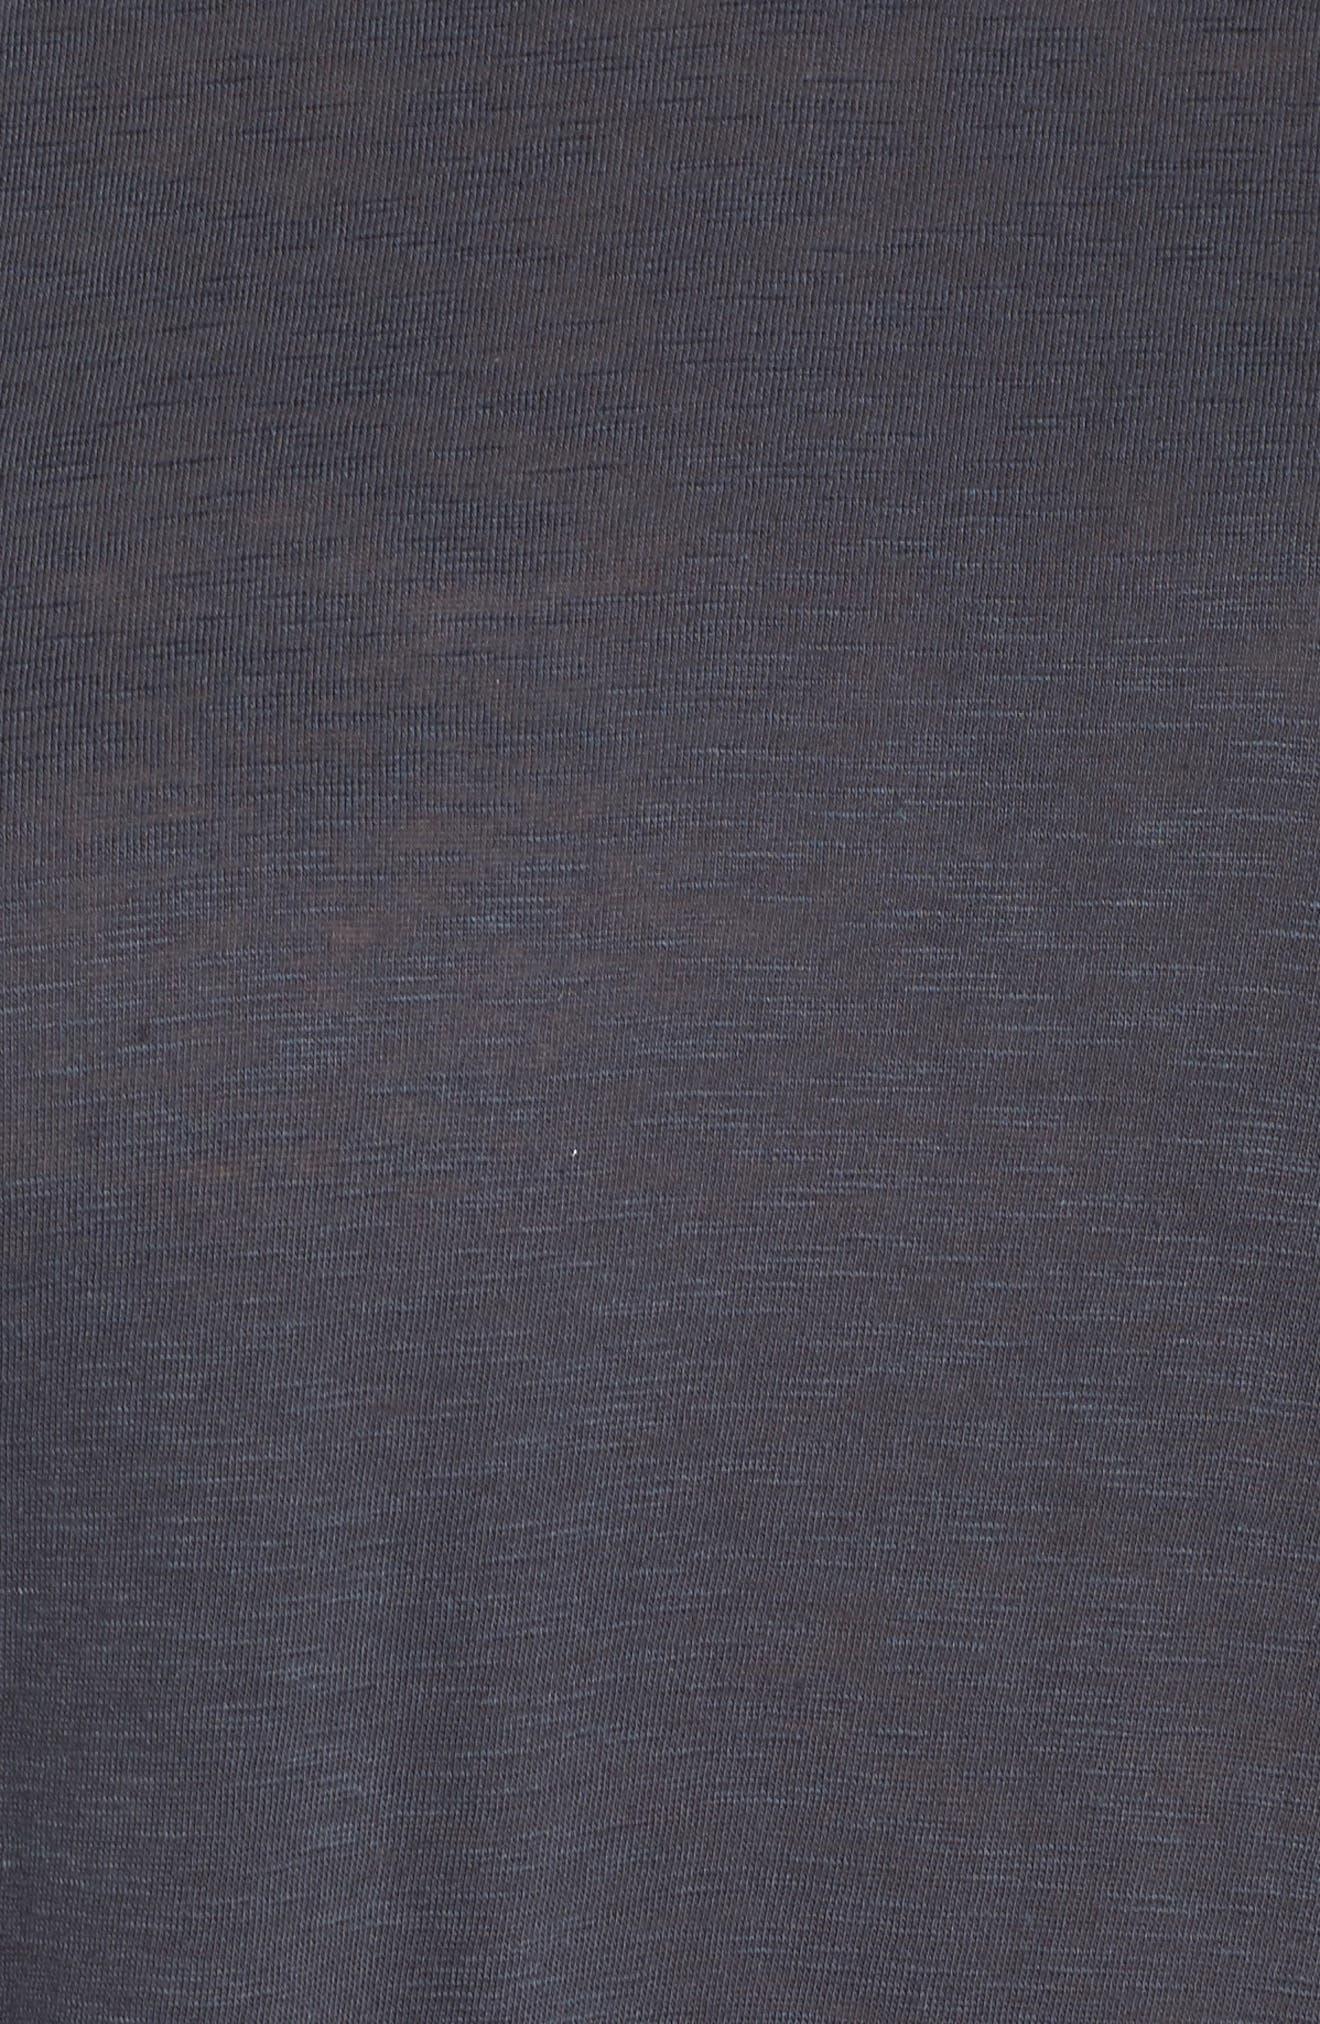 Long Sleeve Crewneck Tee,                             Alternate thumbnail 35, color,                             Grey Ebony